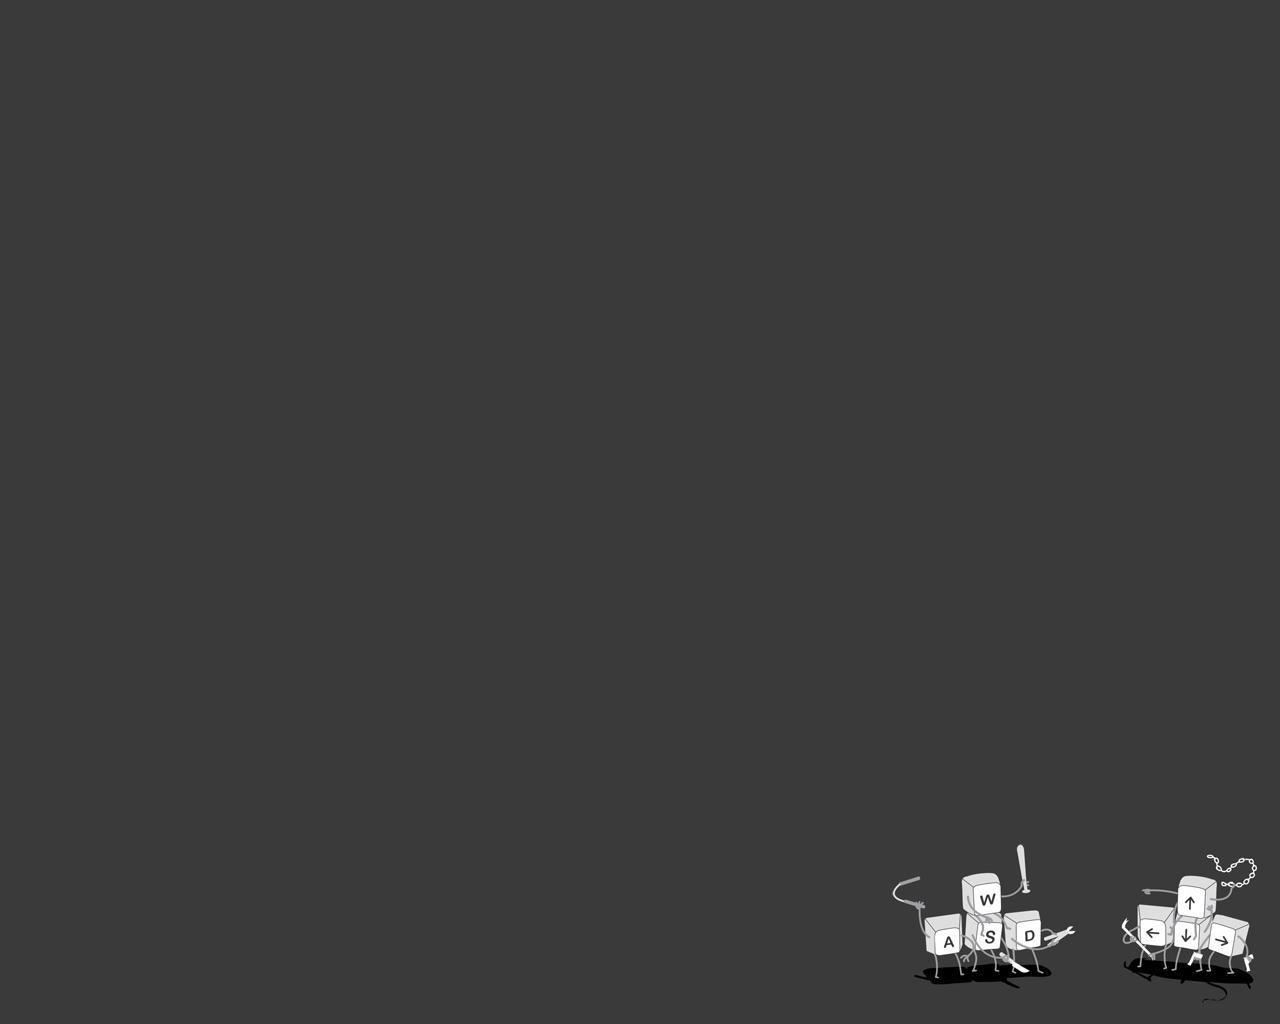 Keyboard Gang Funny Iphone Wallpaper Minimalist Wallpaper